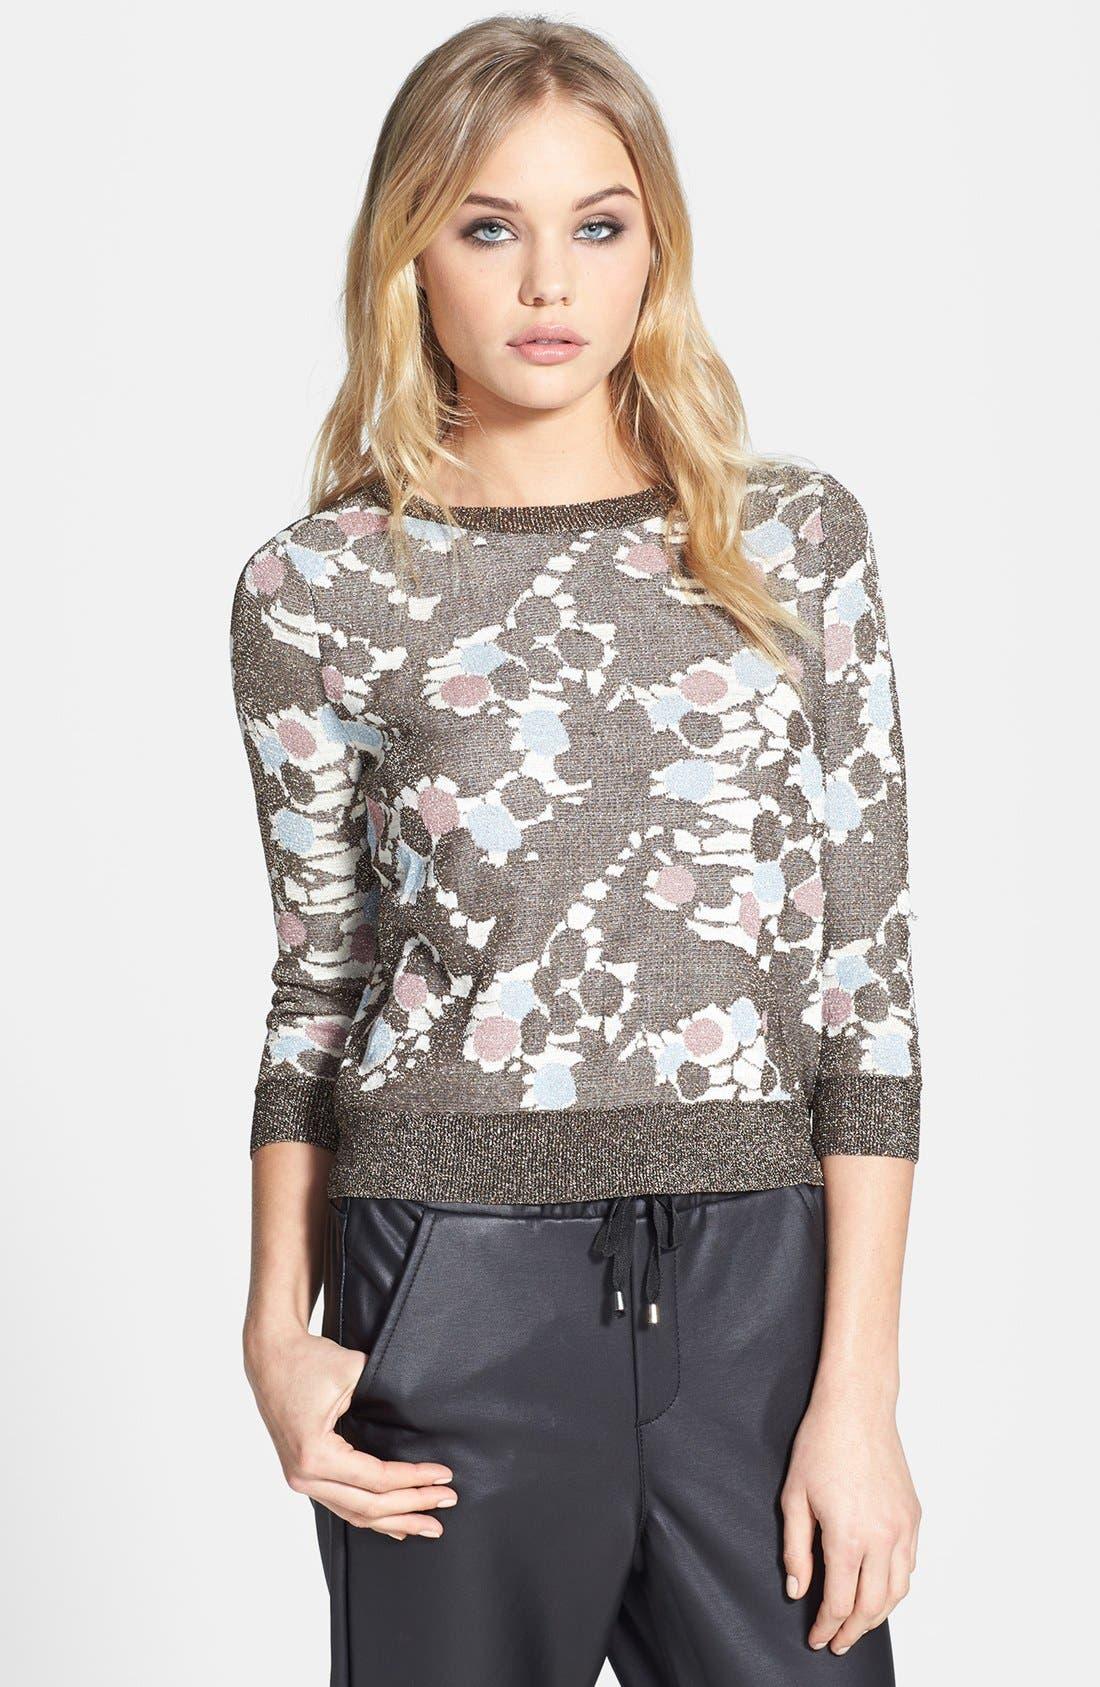 Alternate Image 1 Selected - Topshop 'Chateau Bronze' Metallic Print Sweater